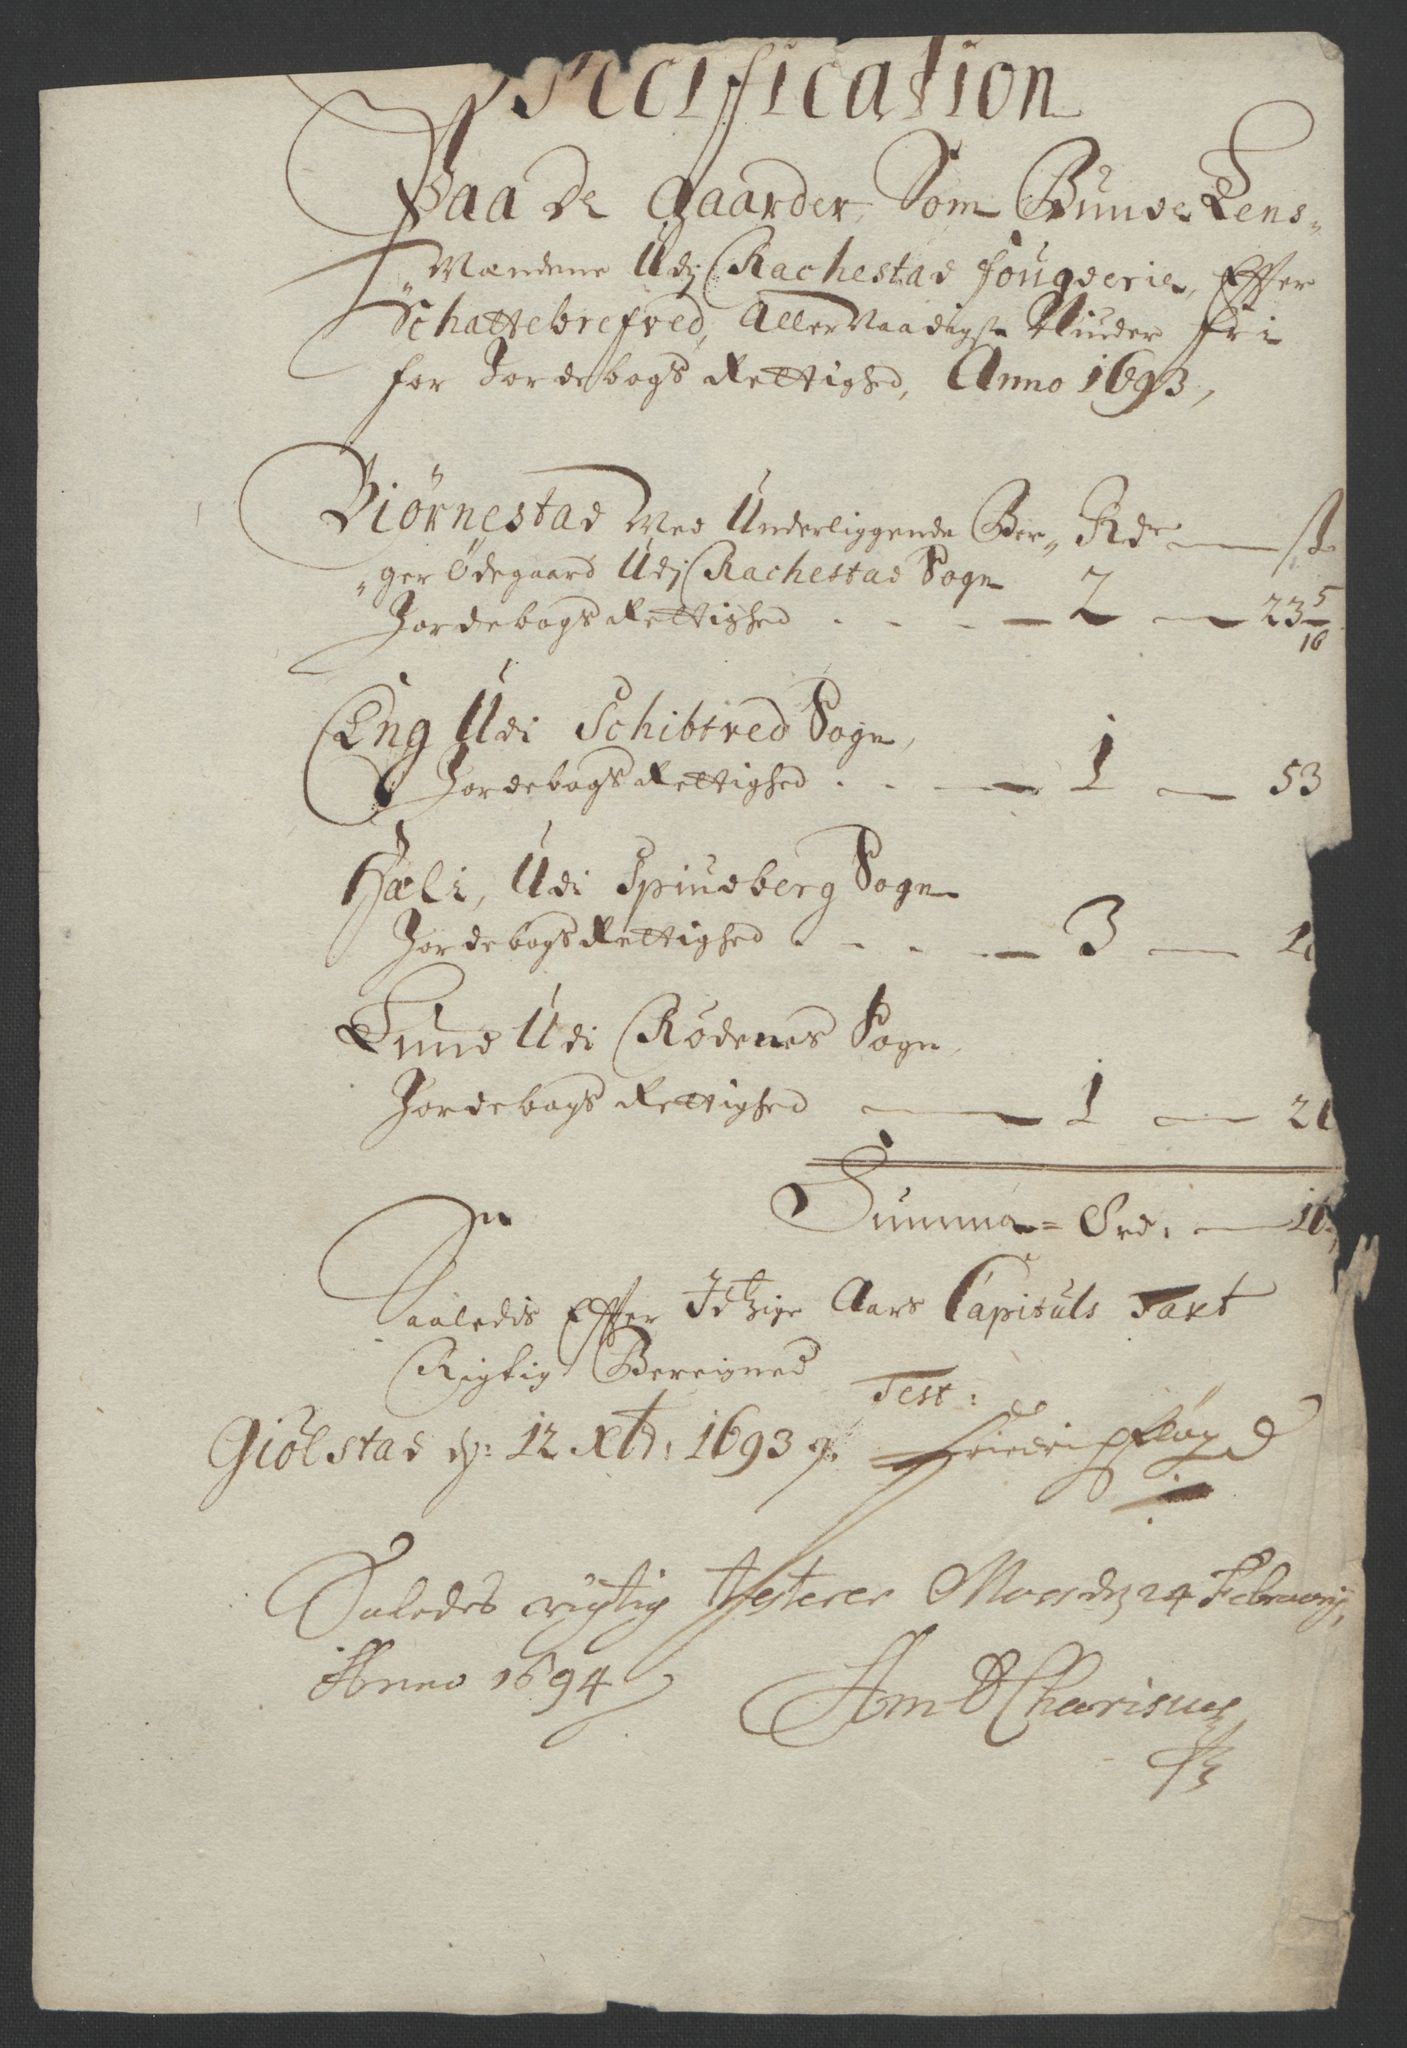 RA, Rentekammeret inntil 1814, Reviderte regnskaper, Fogderegnskap, R05/L0278: Fogderegnskap Rakkestad, 1691-1693, s. 528